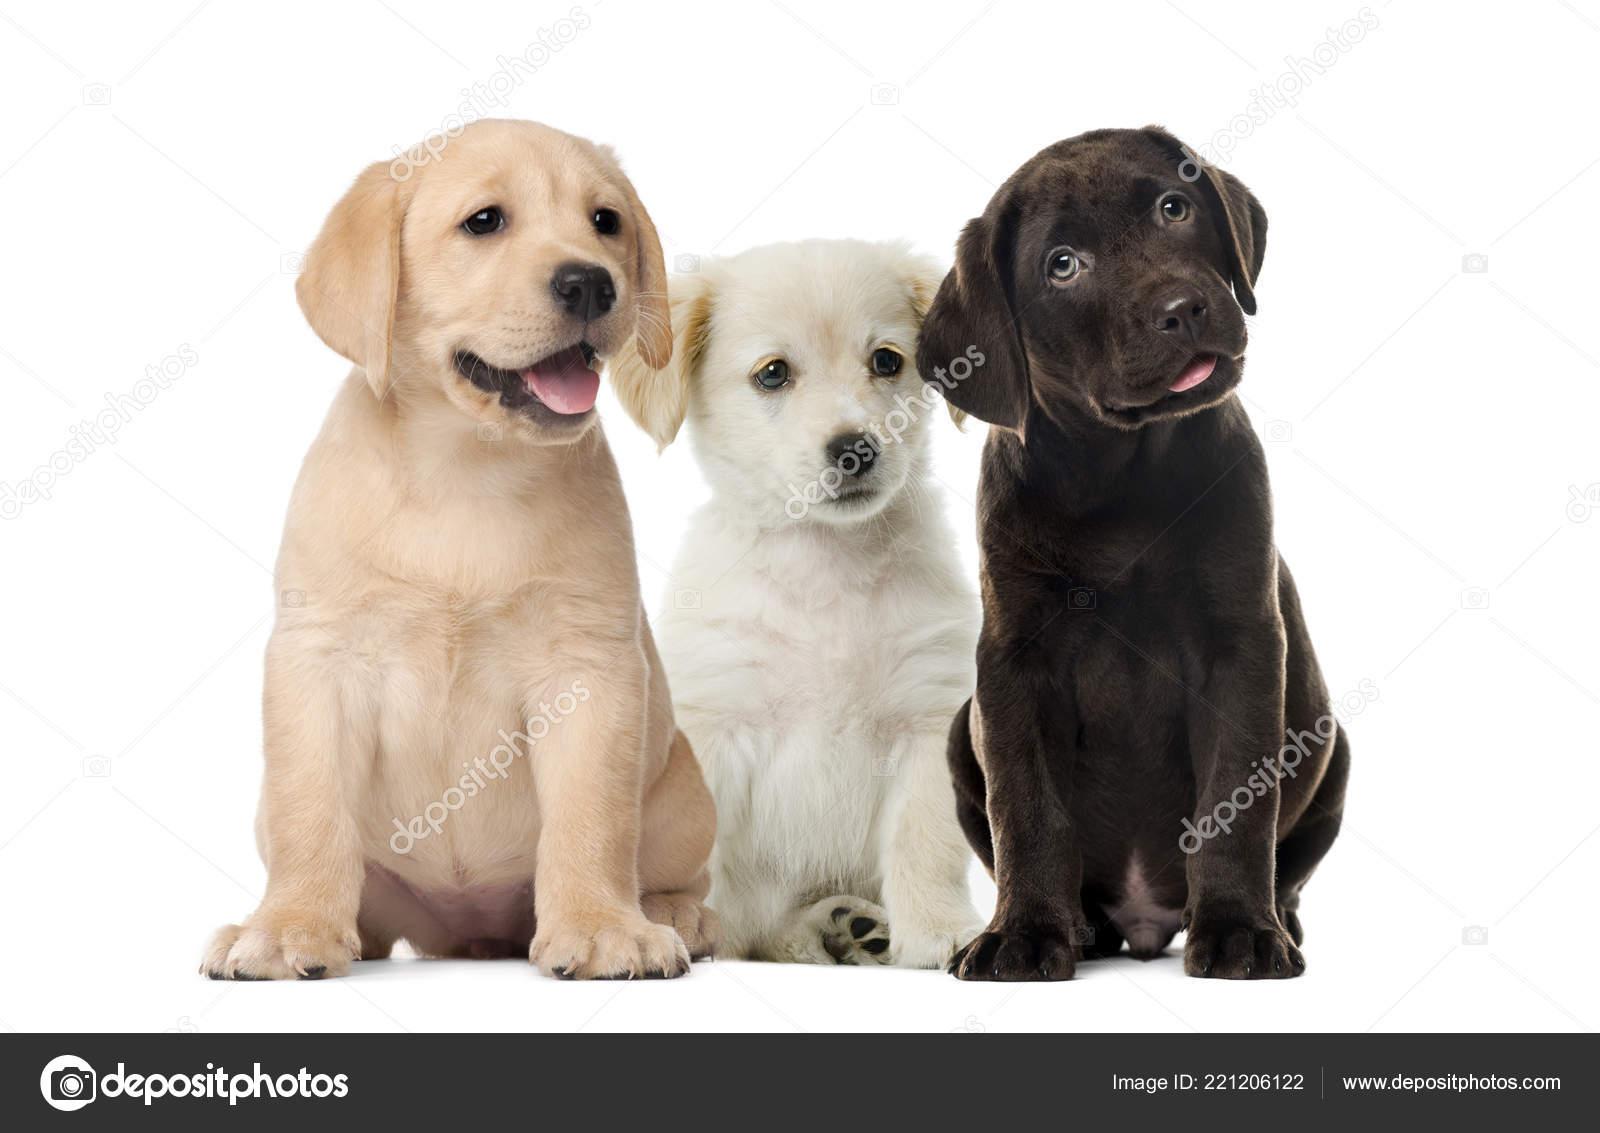 Groups Dogs Labrador Puppies Puppy Chocolate Labrador Retriever